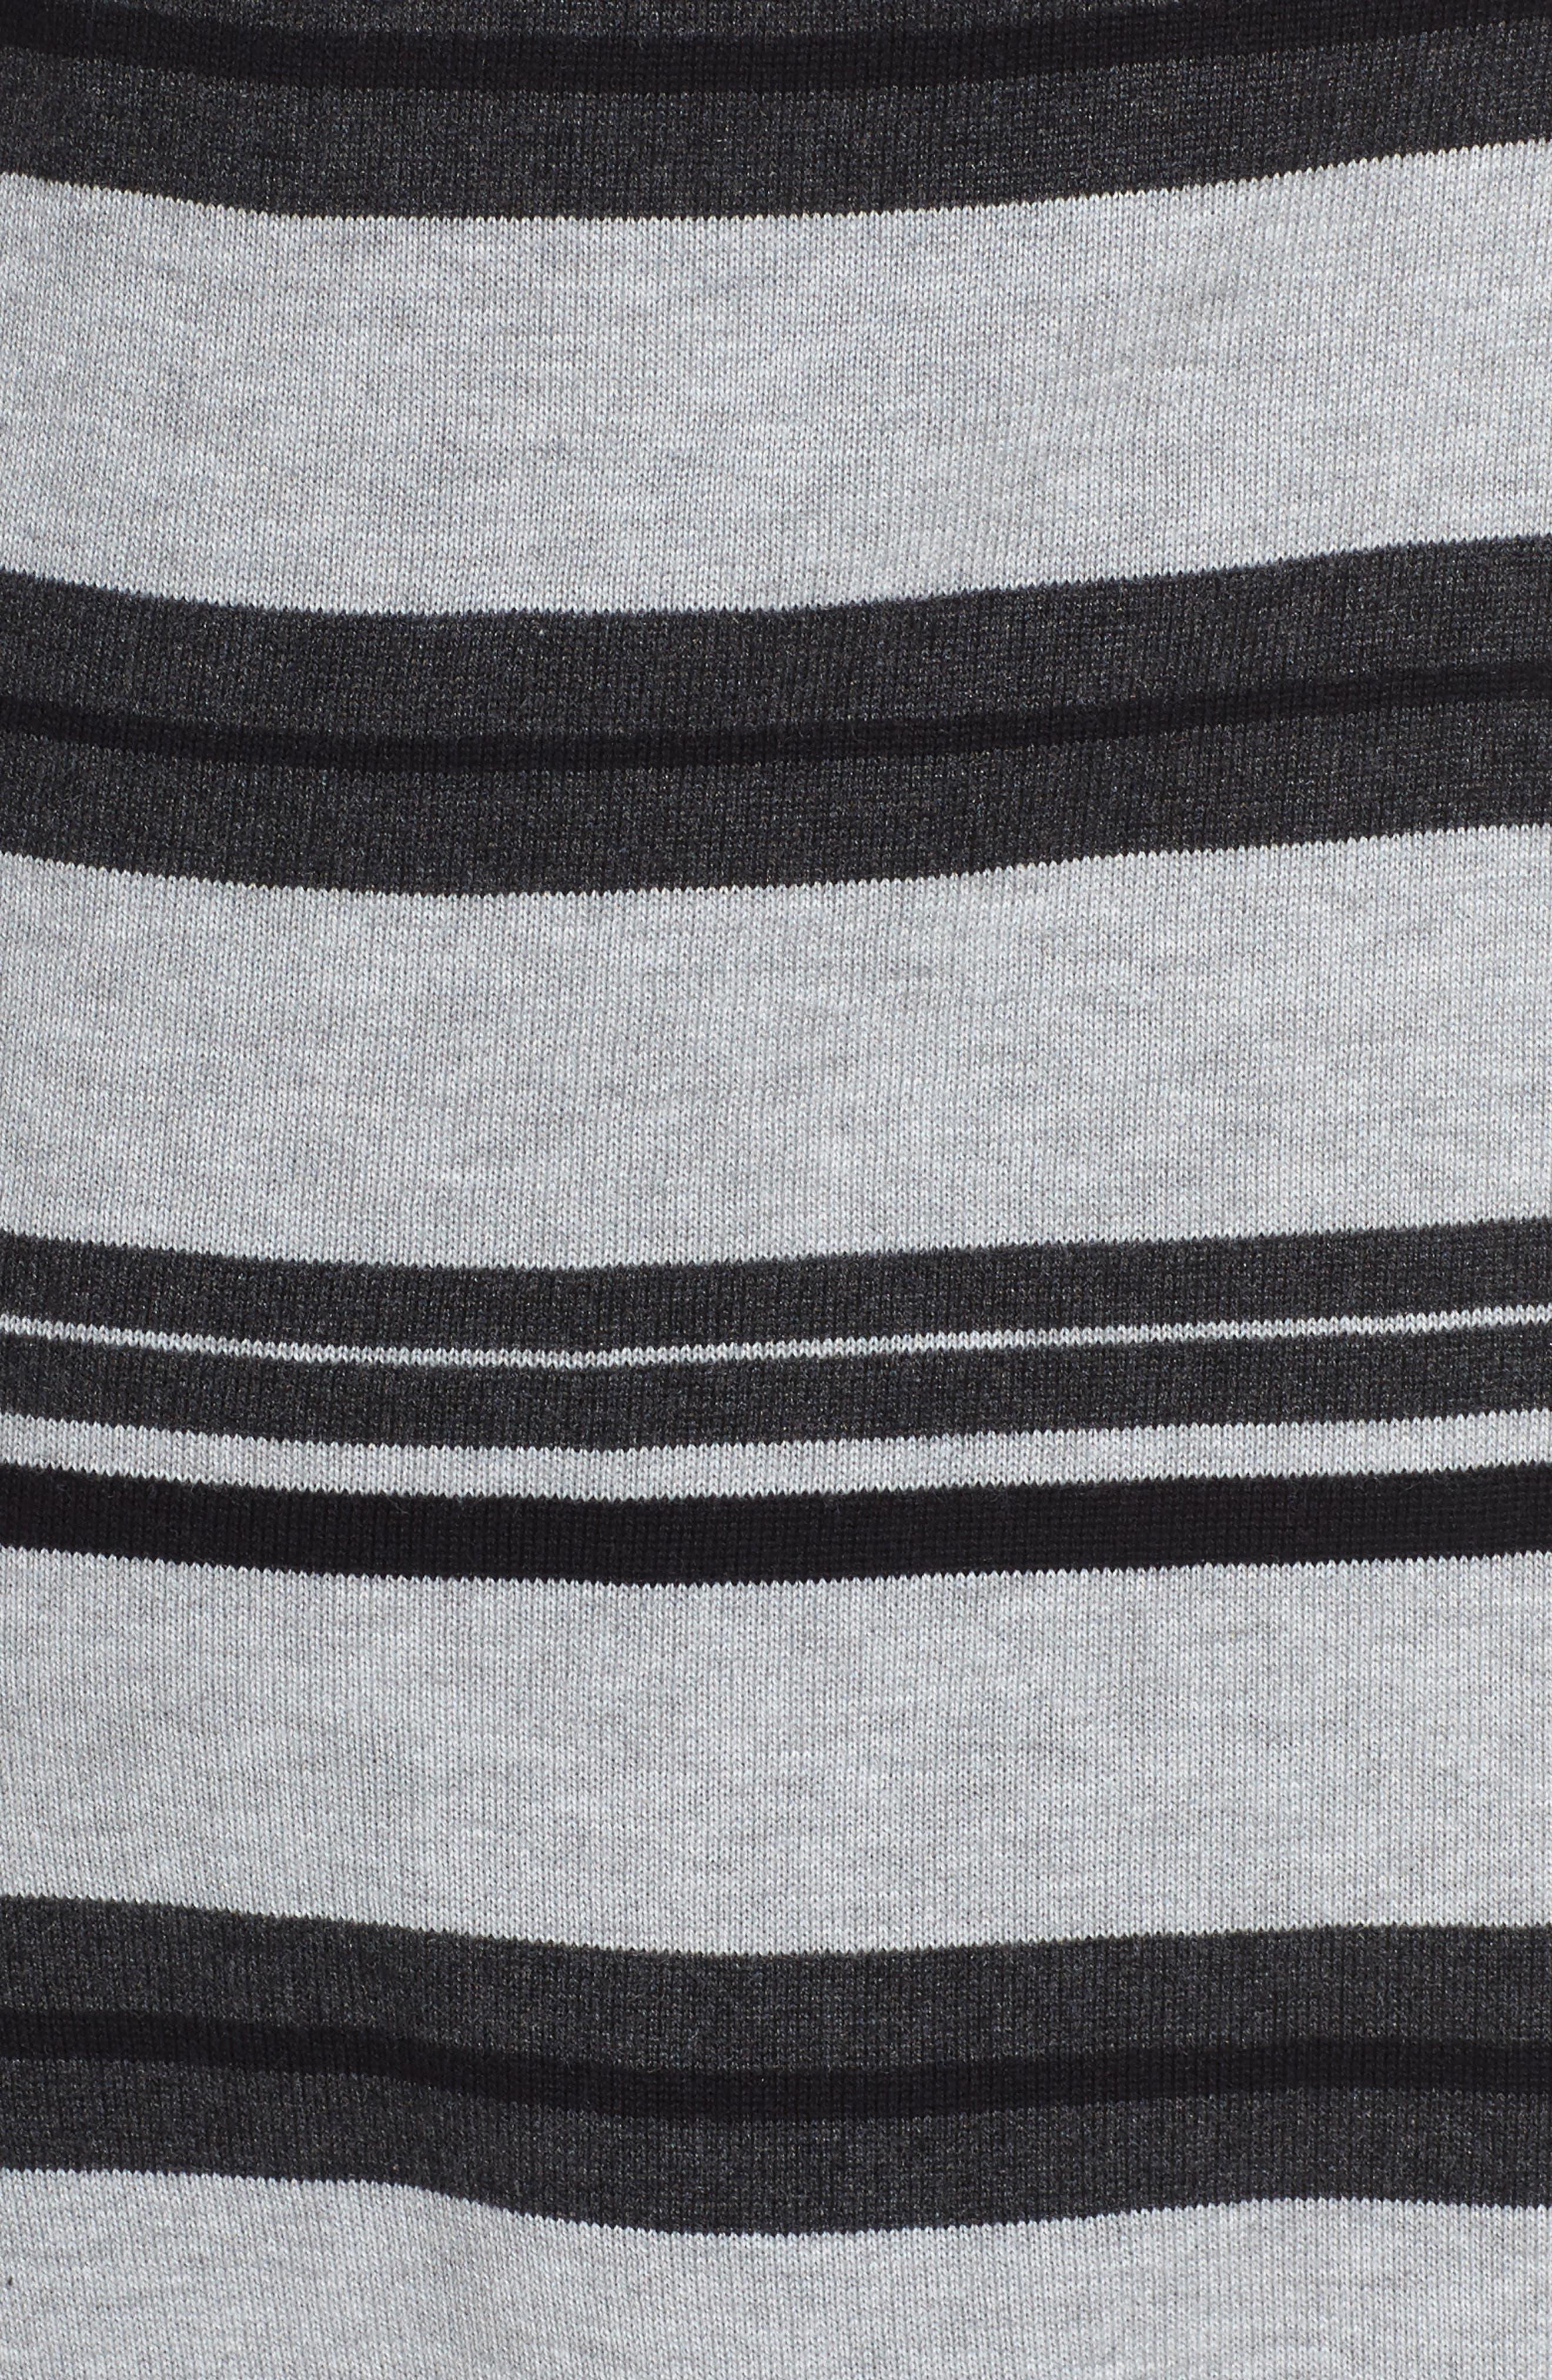 Long Stripe Cardigan,                             Alternate thumbnail 5, color,                             028